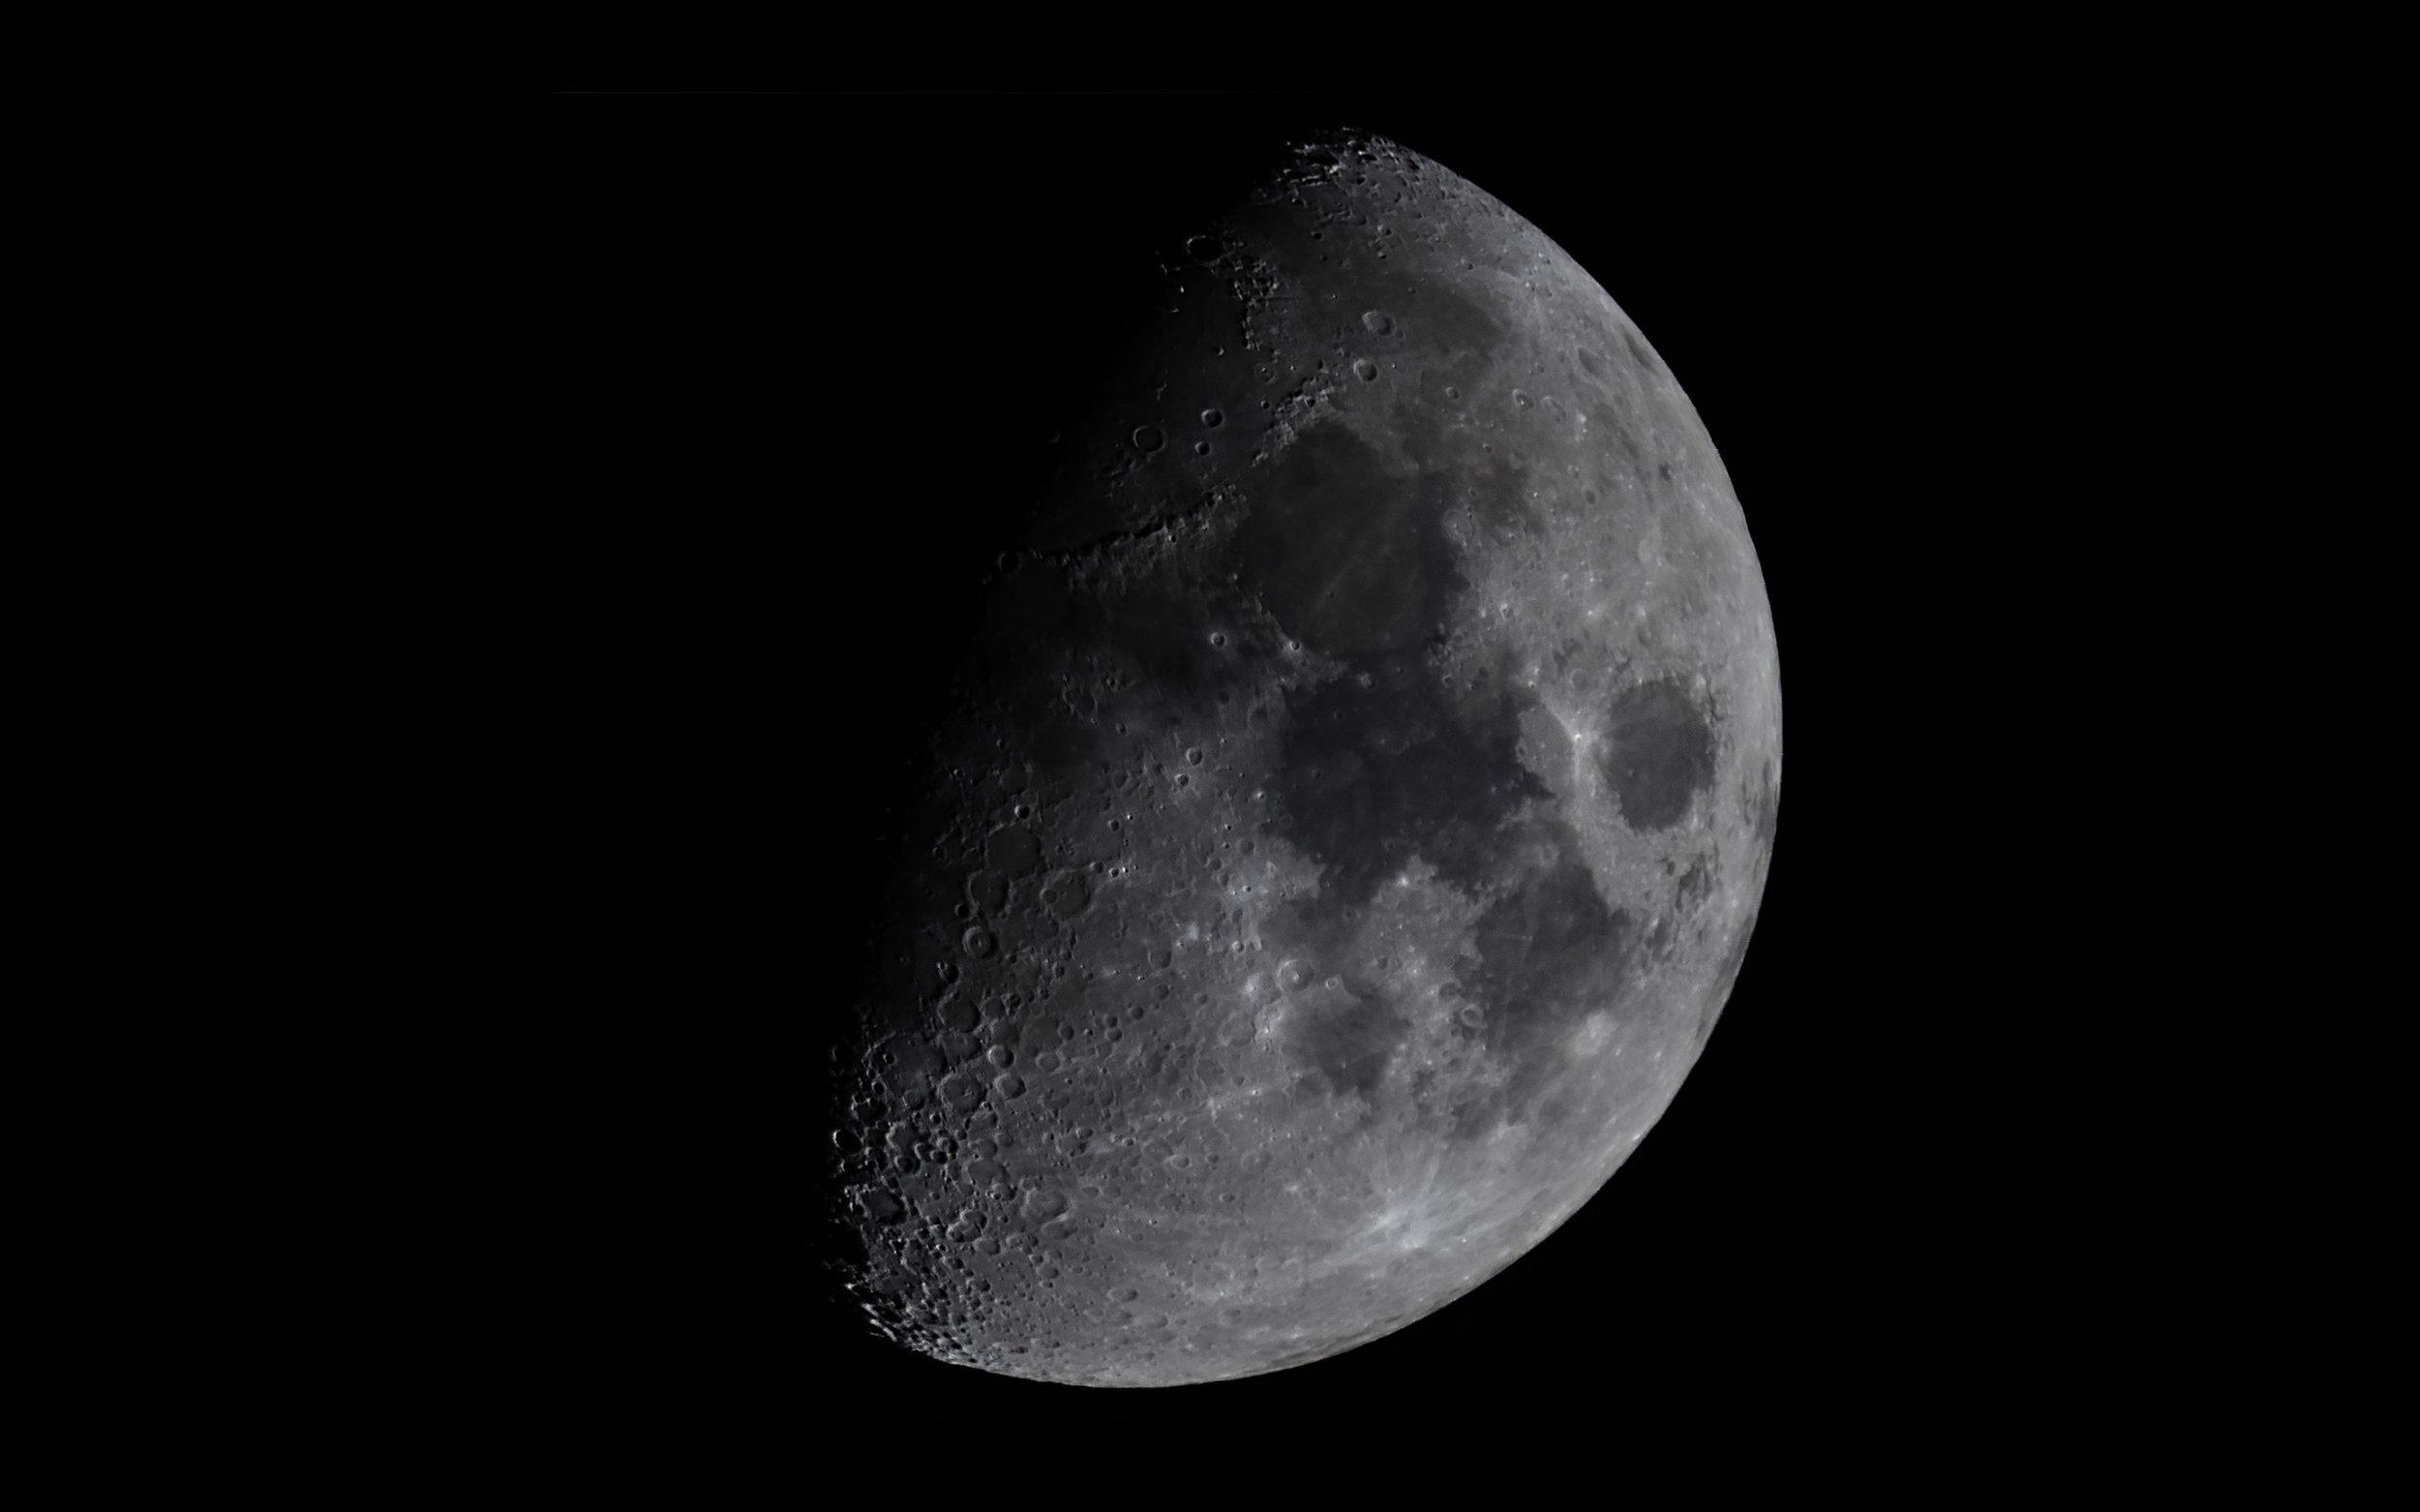 First Quarter Moon - 55% illuminated 8 days old